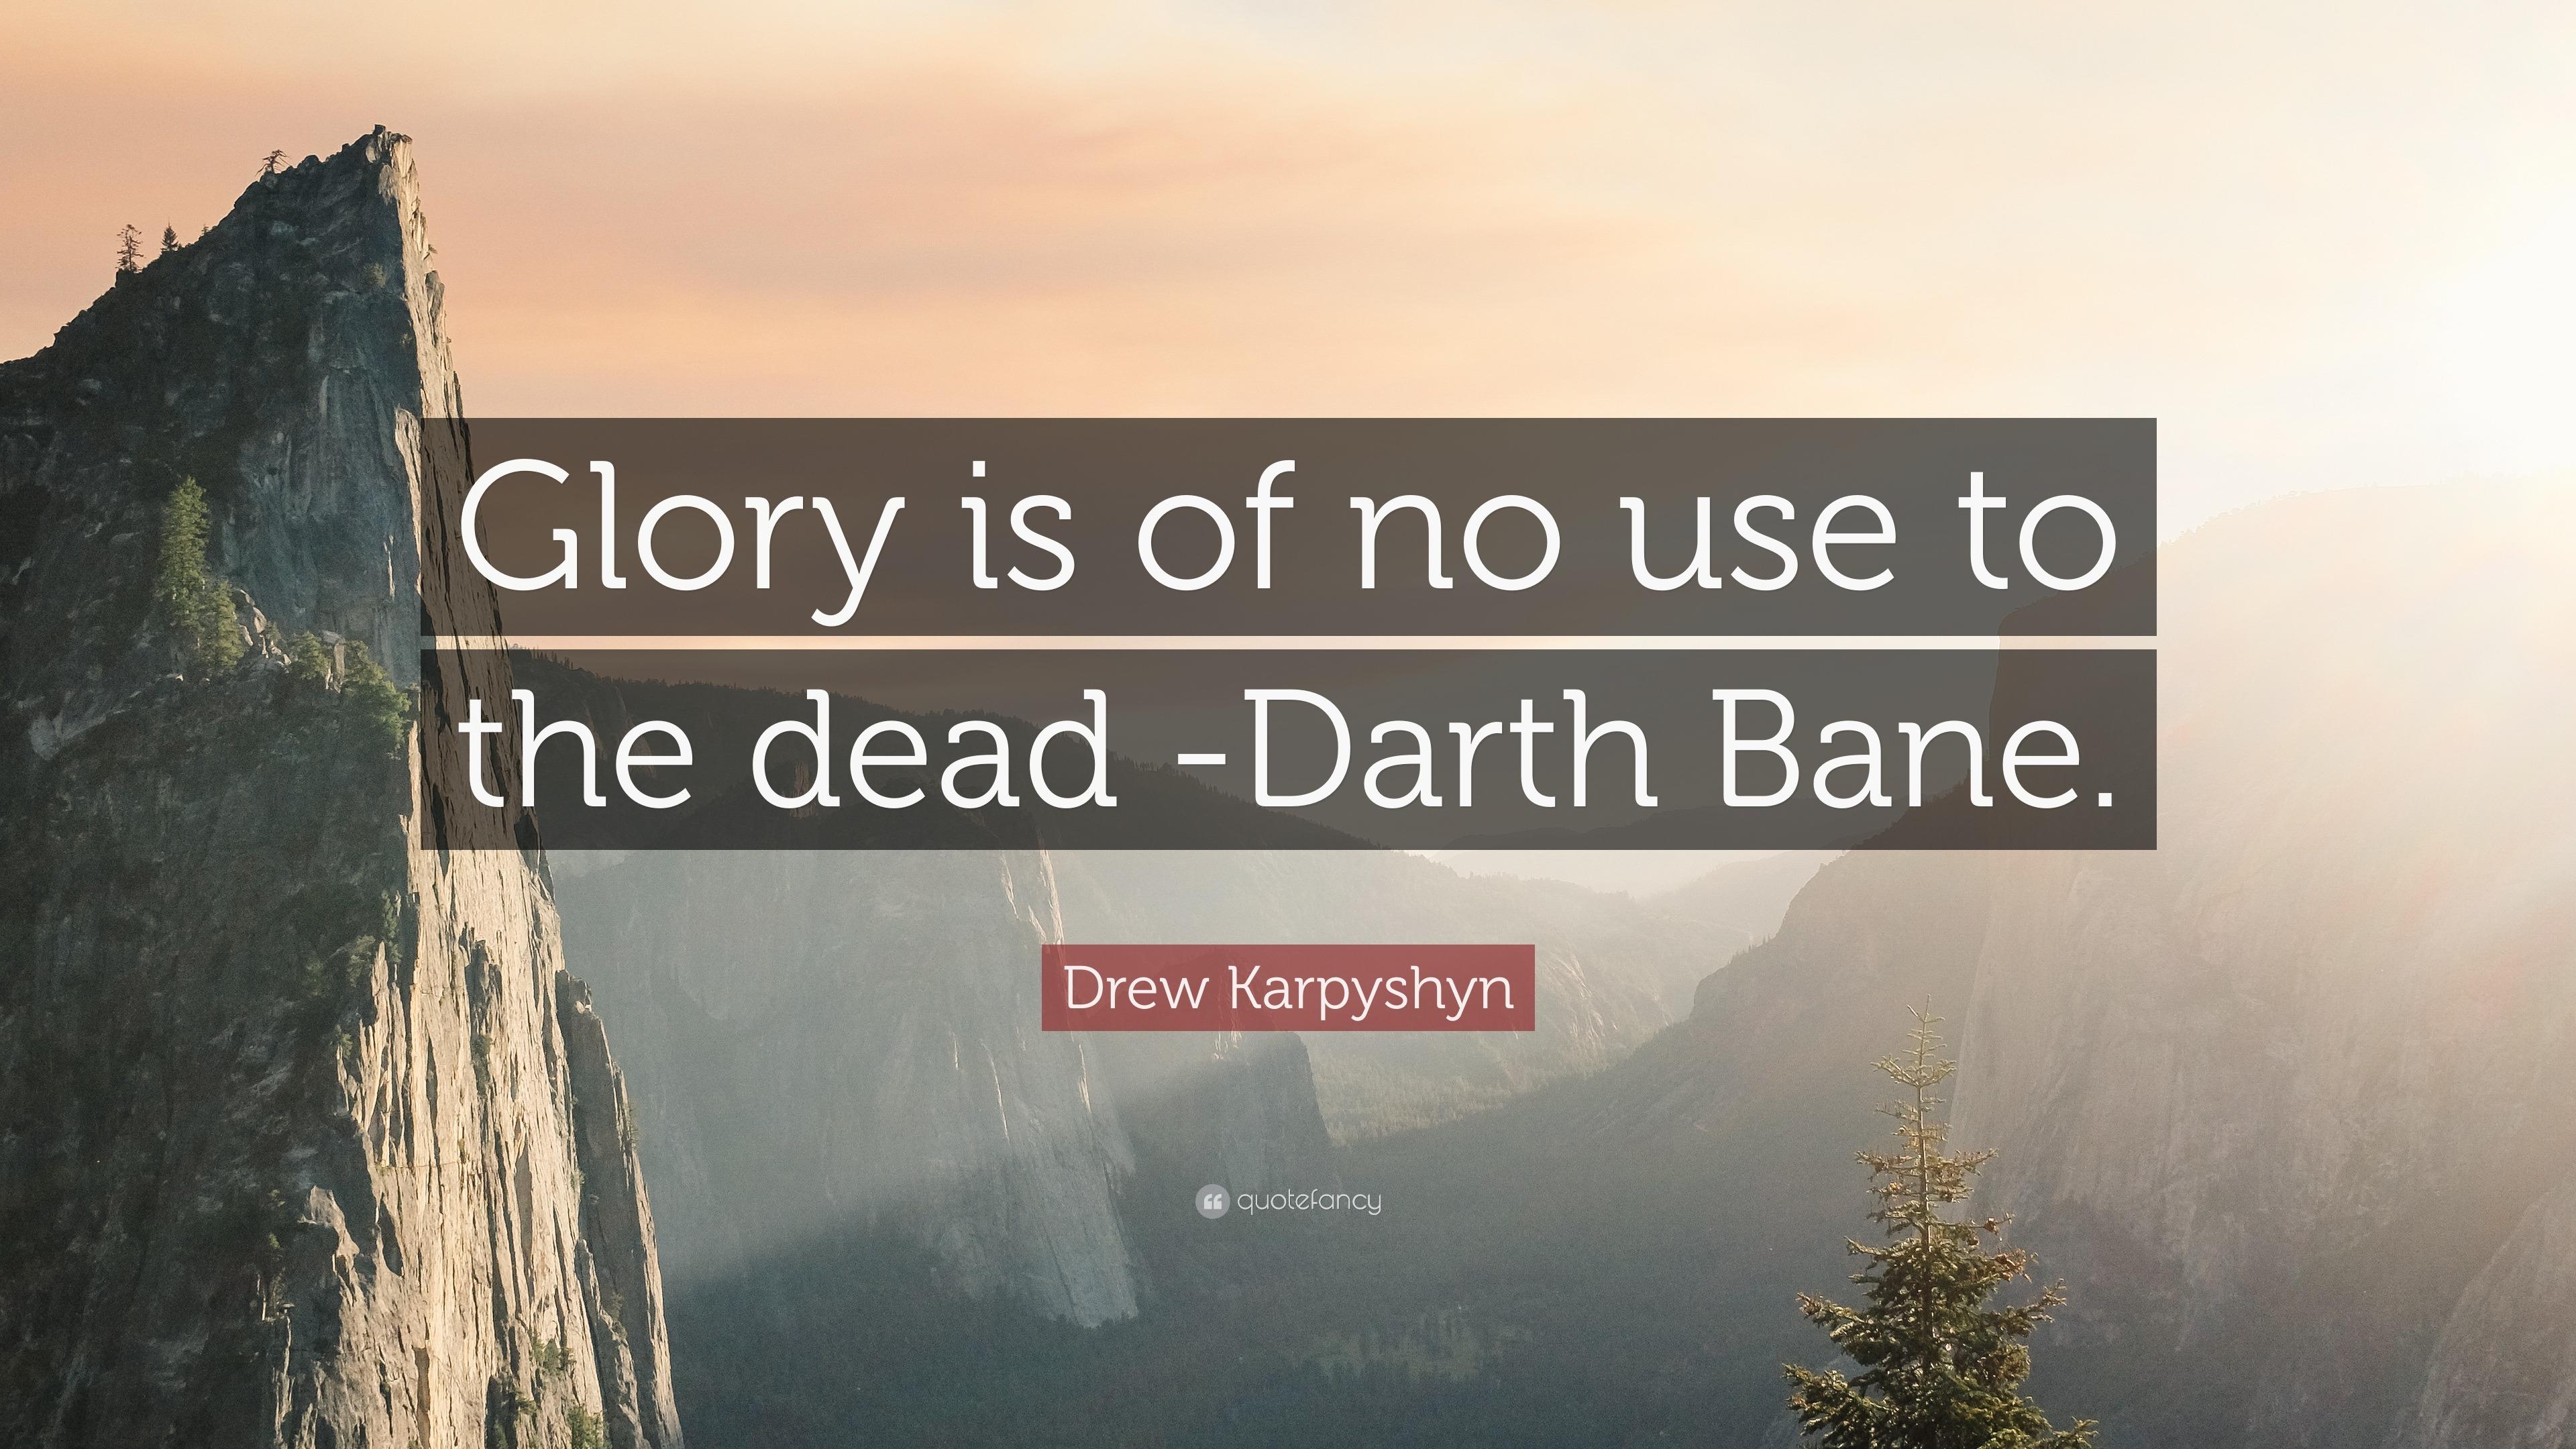 Drew Karpyshyn Quotes 6 Wallpapers Quotefancy